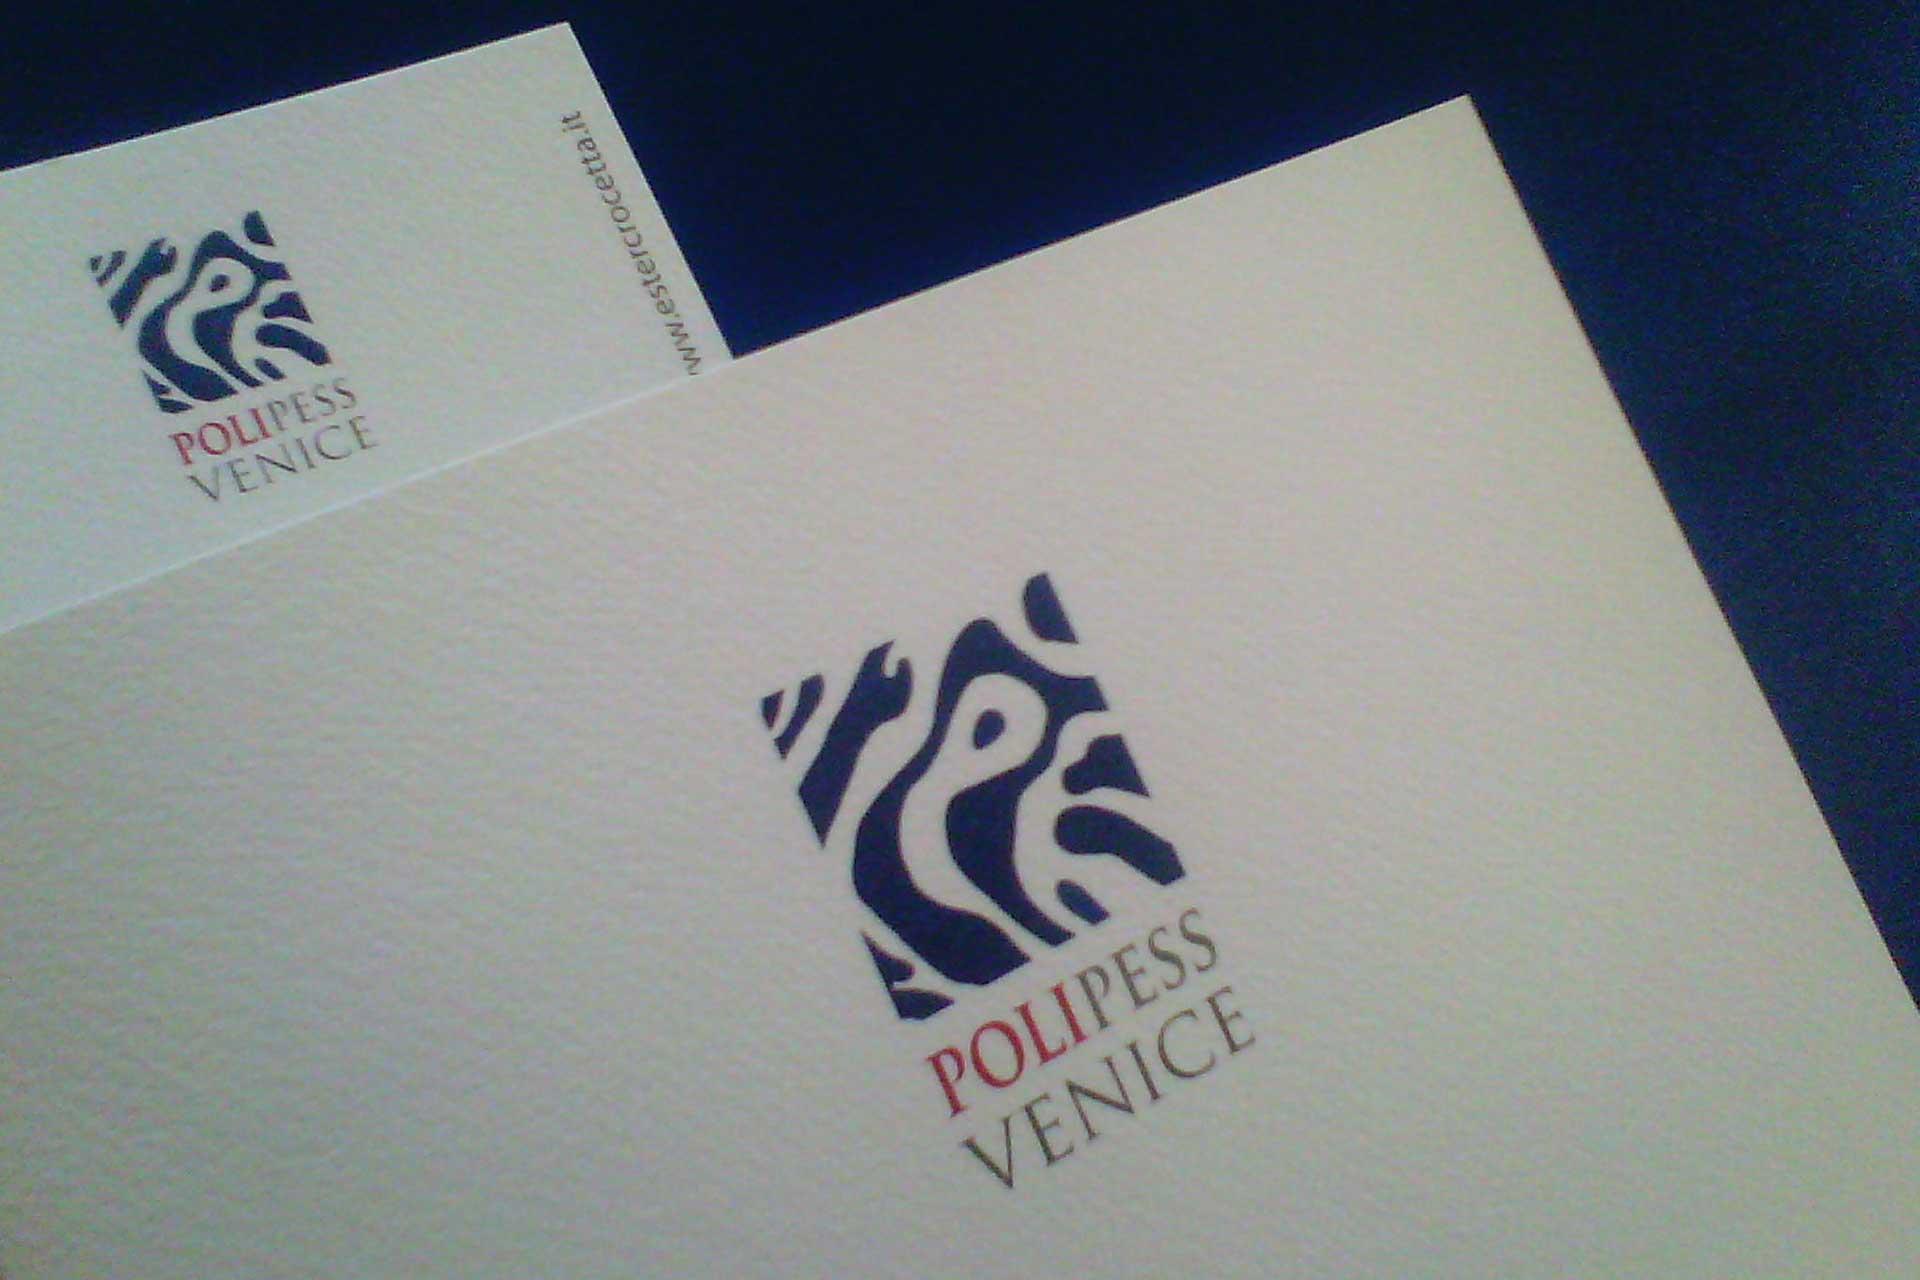 catalogo polipess venice brochure